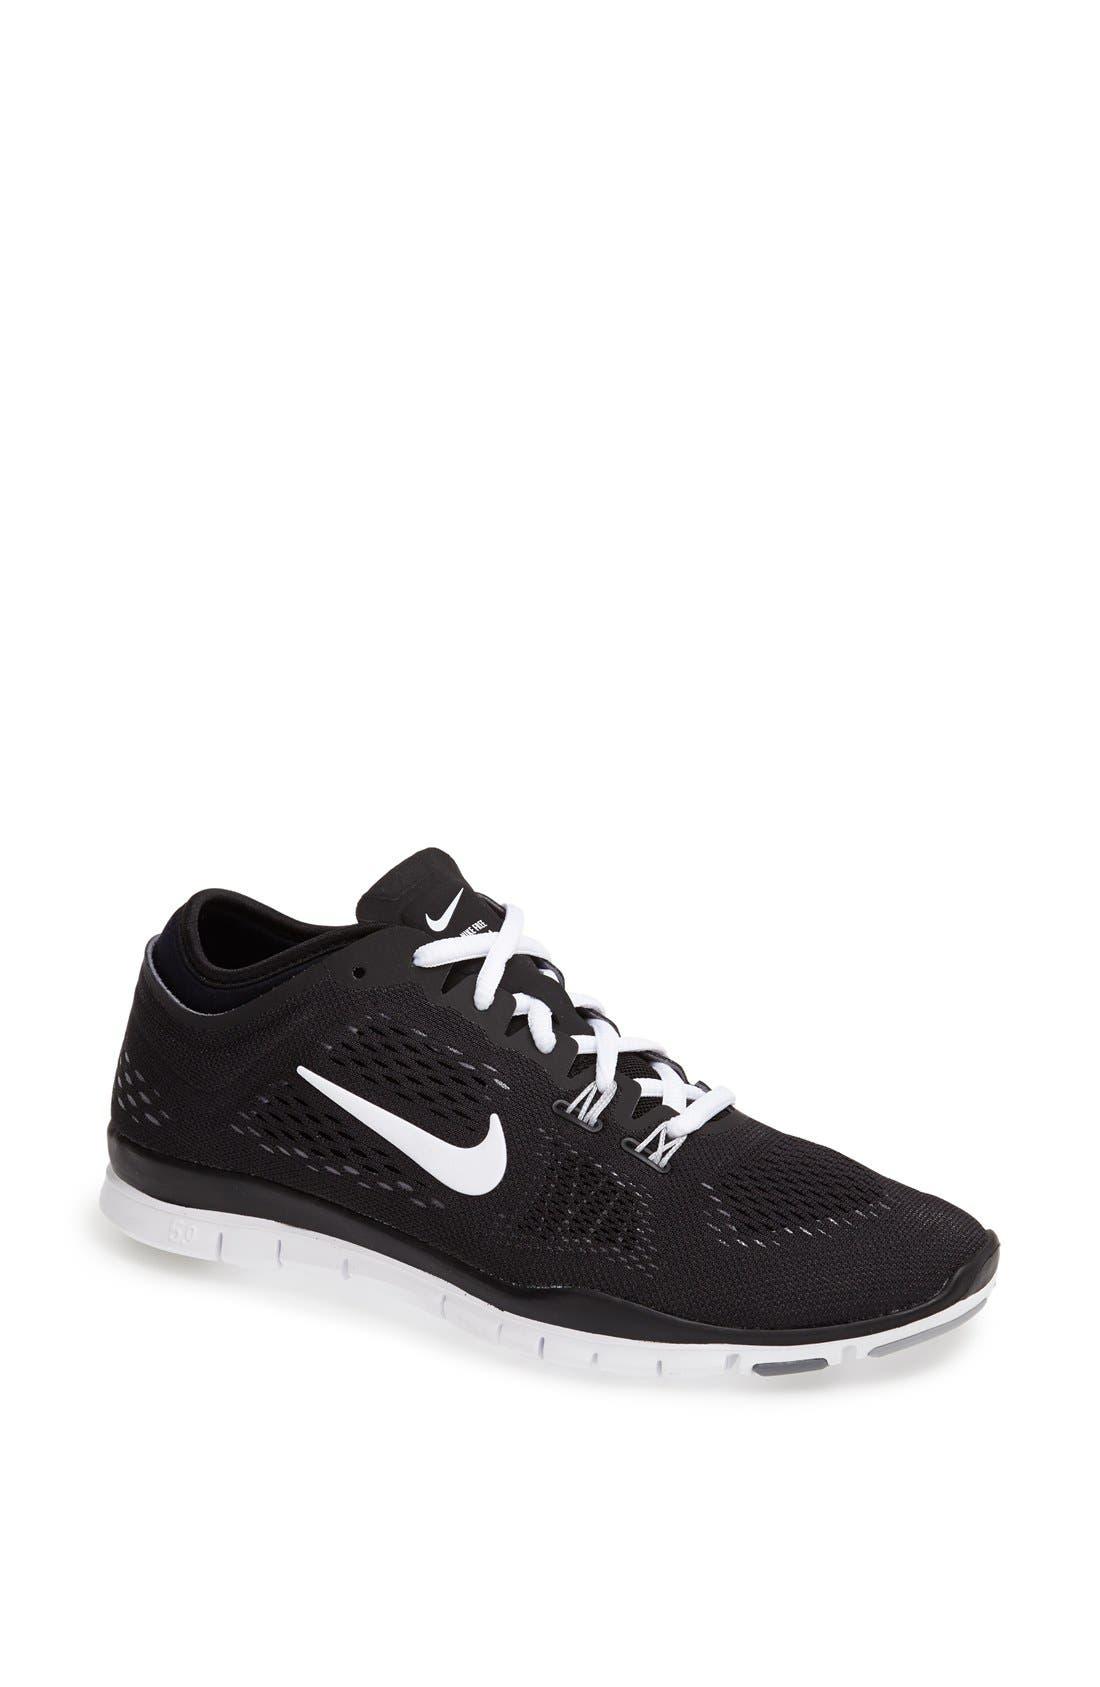 Nike 'Free 5.0 TR Fit 4' Training Shoe